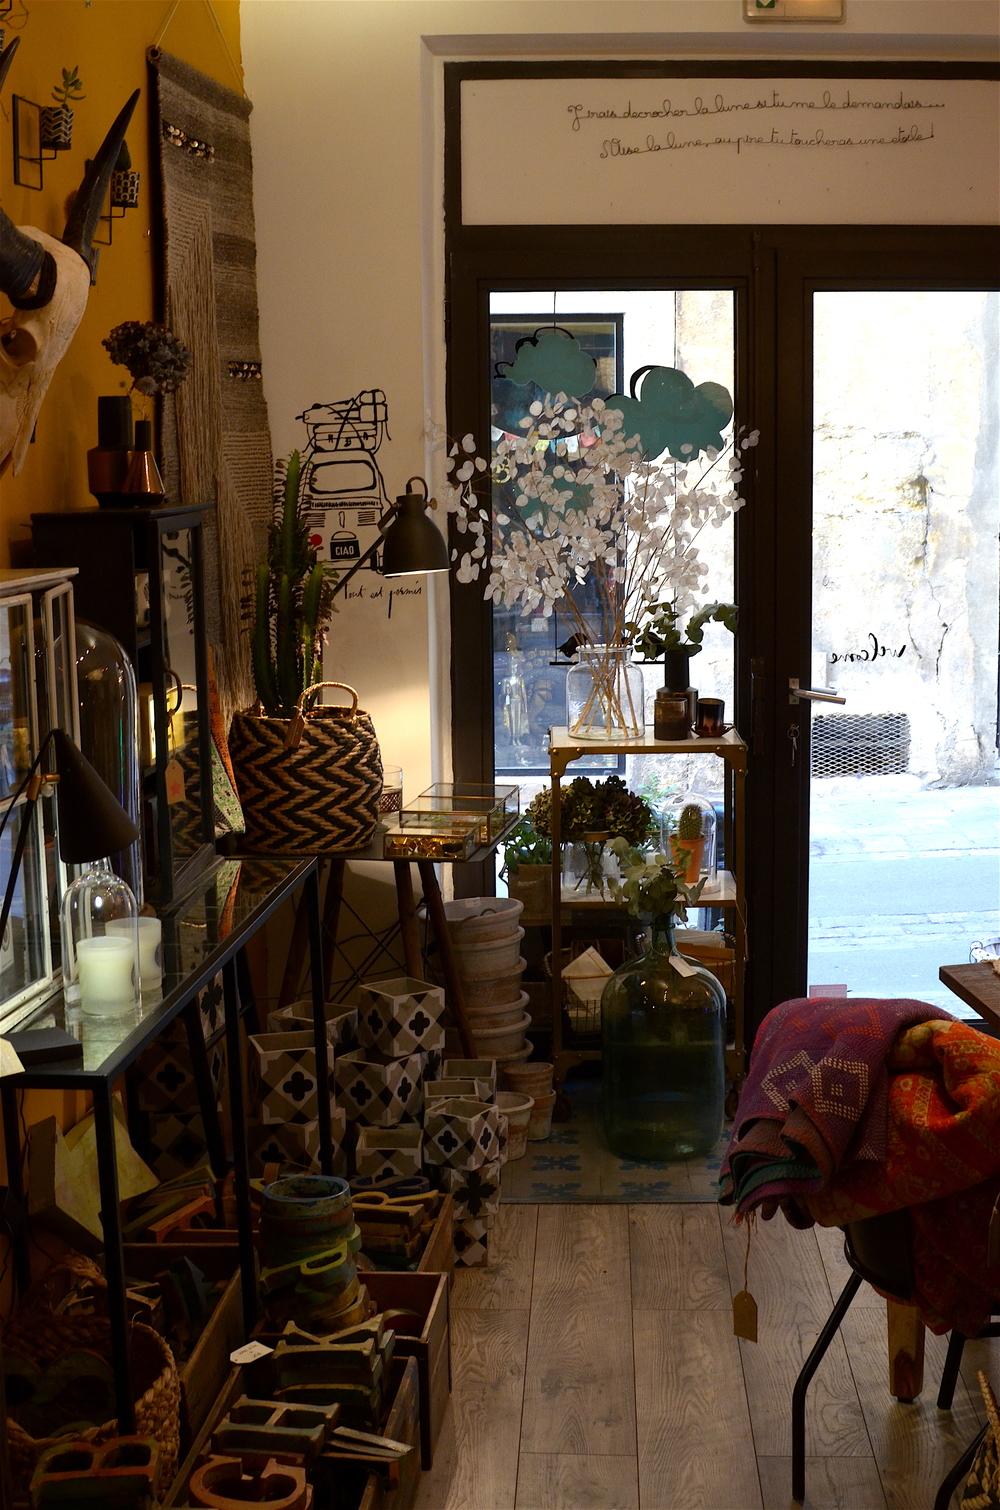 twinky lizzy aix en provence - vingt huit janvier 07.jpg